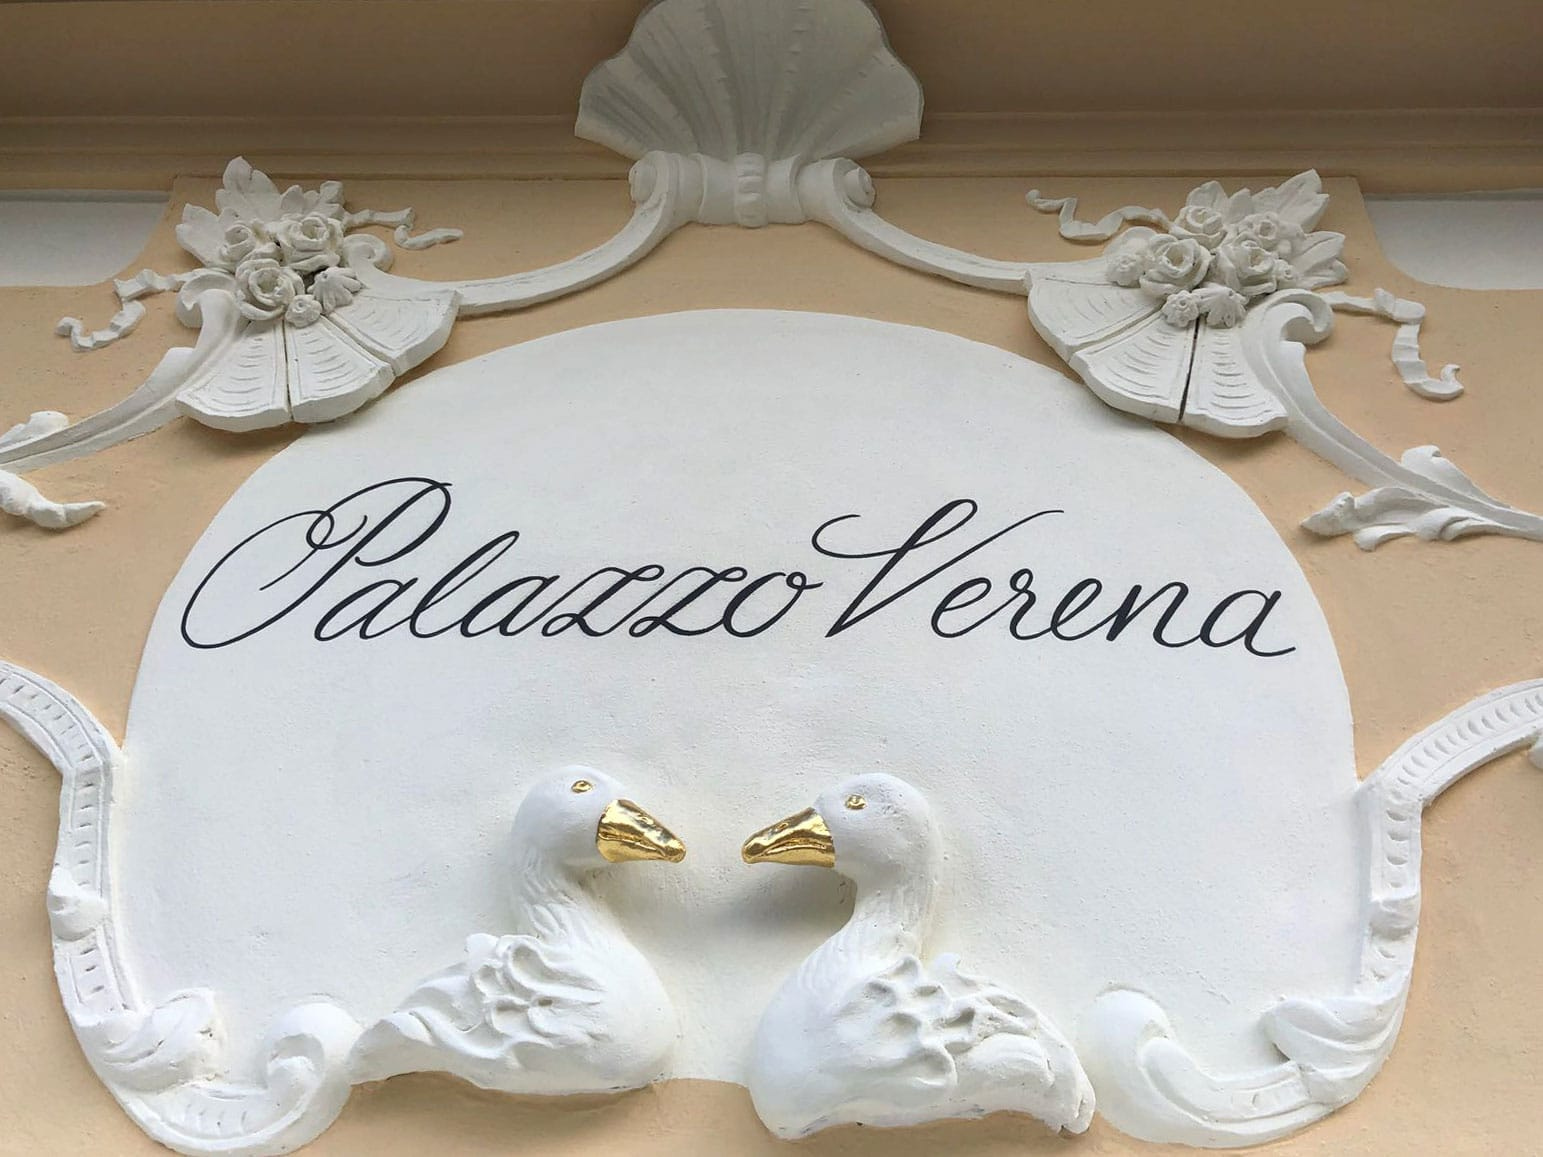 Palazzo Verena Fassade Detail